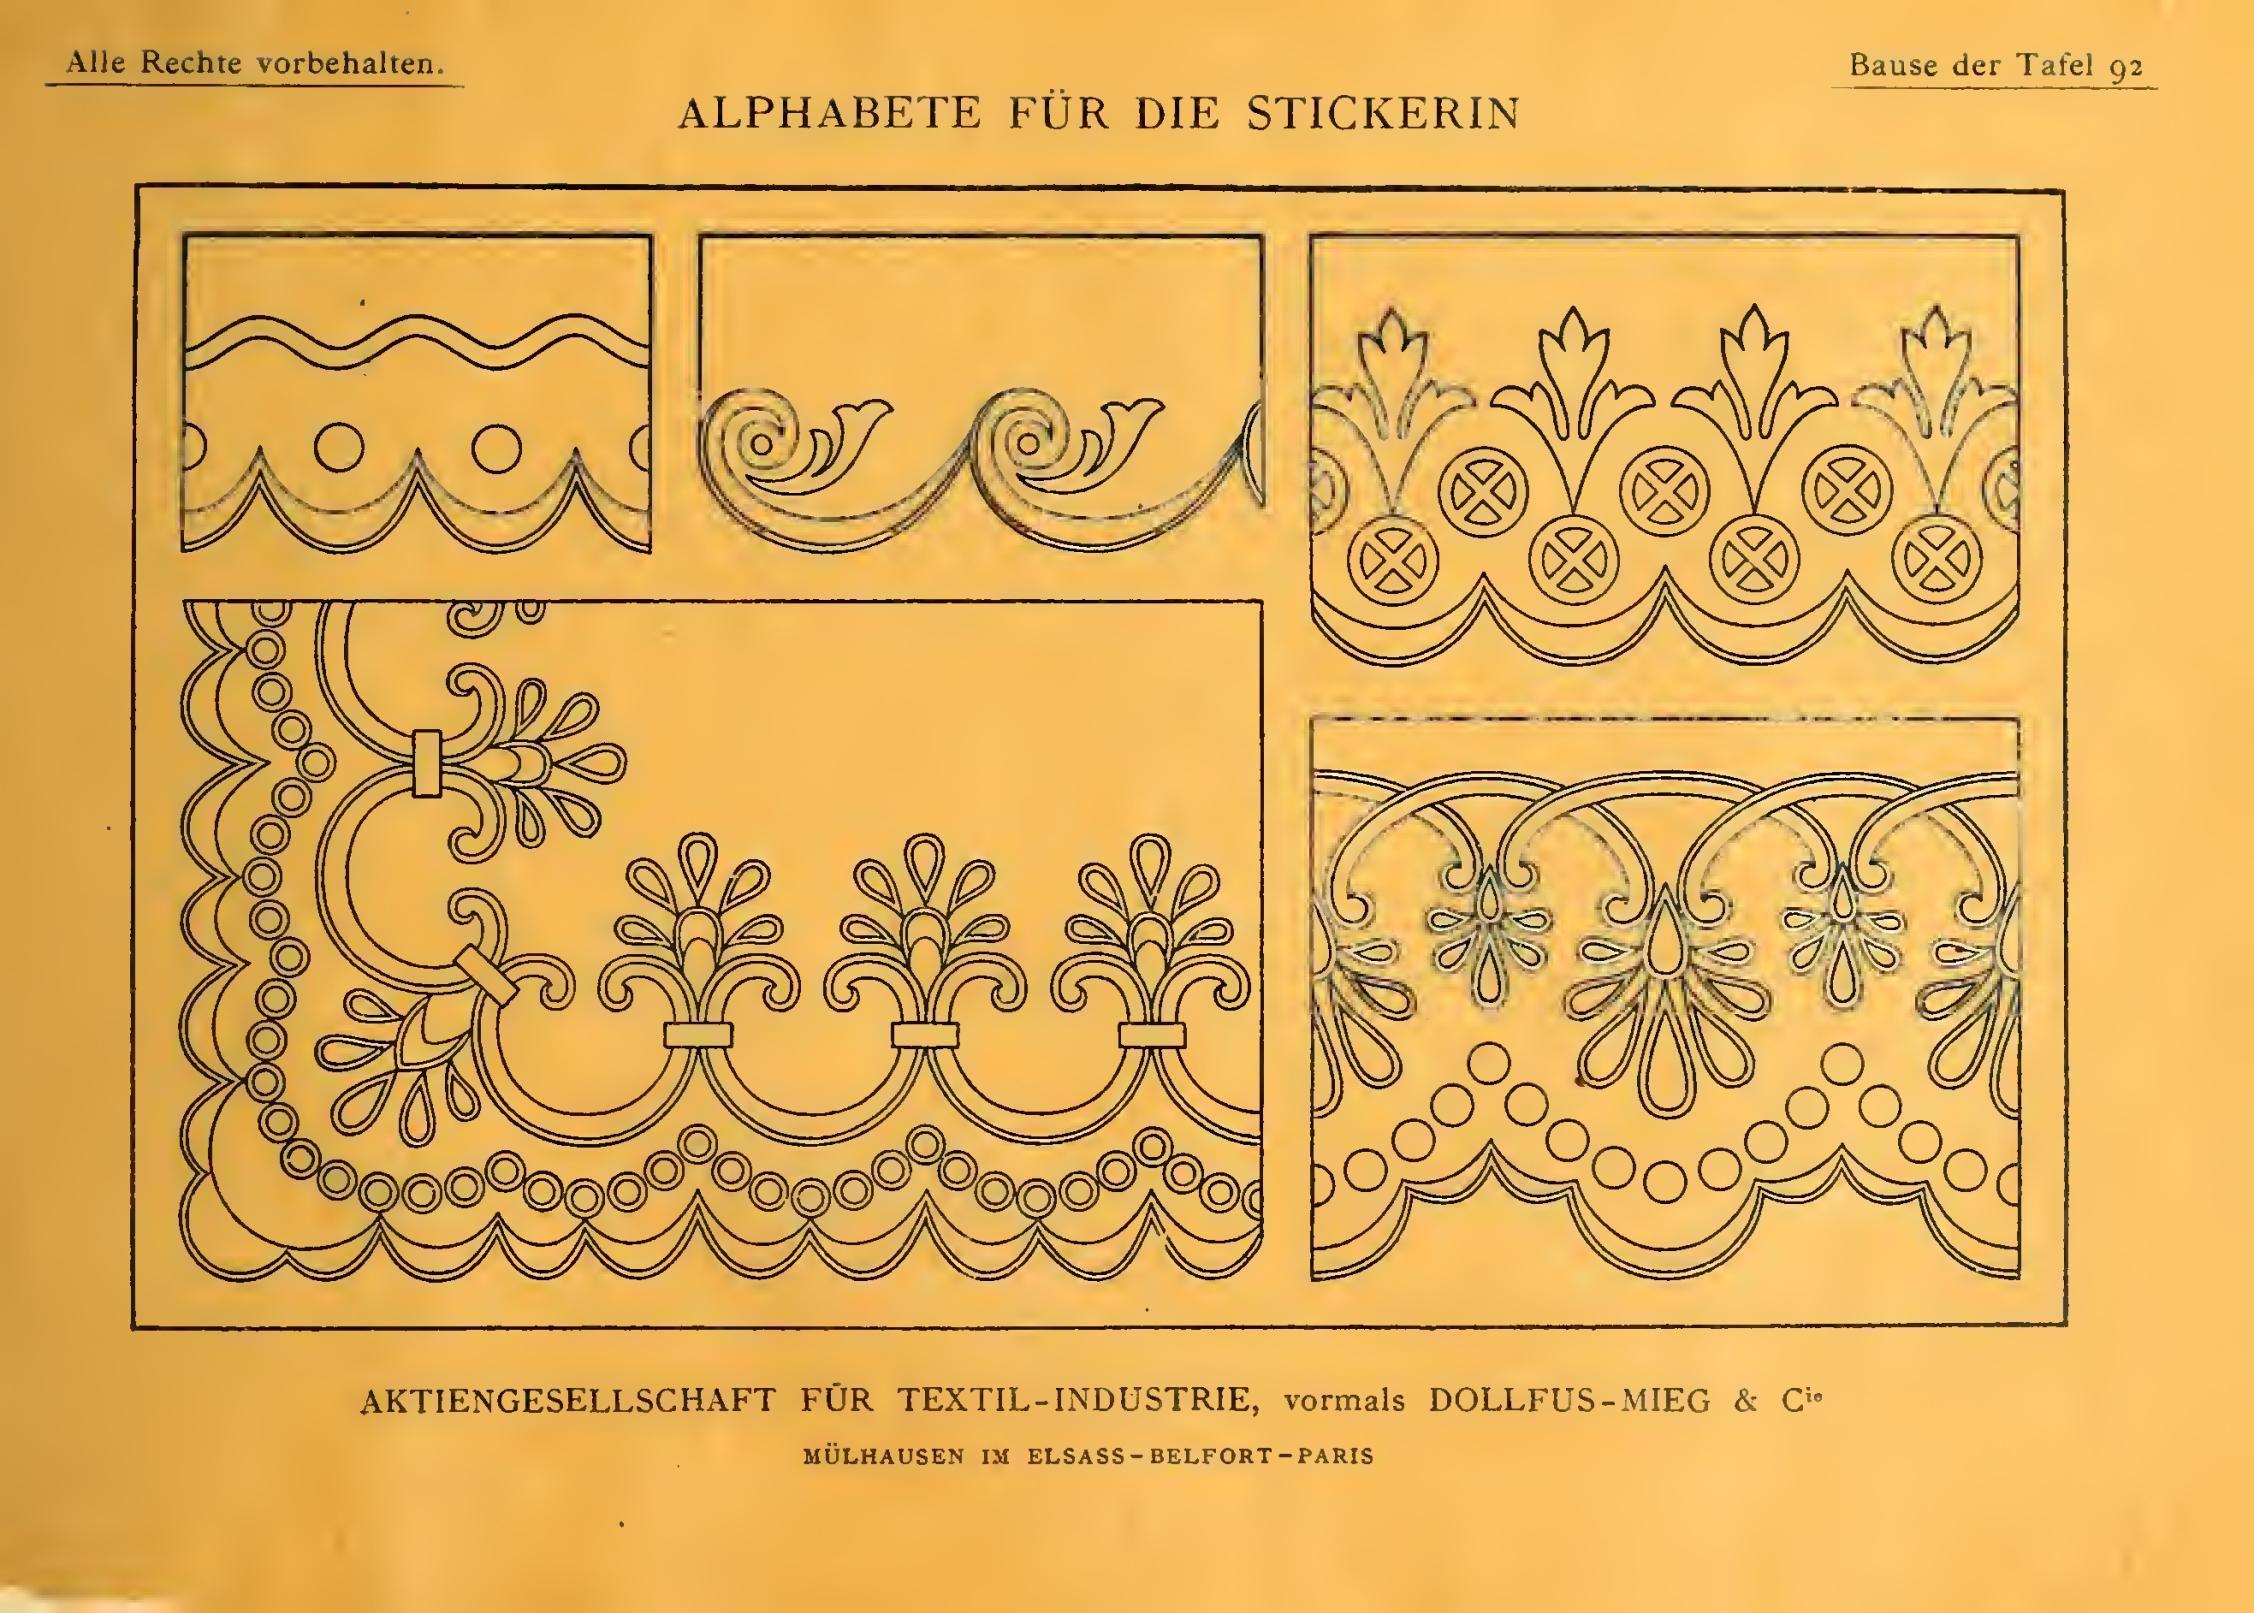 Pin de Valerie Robins en Embroidery - Patterns | Pinterest ...